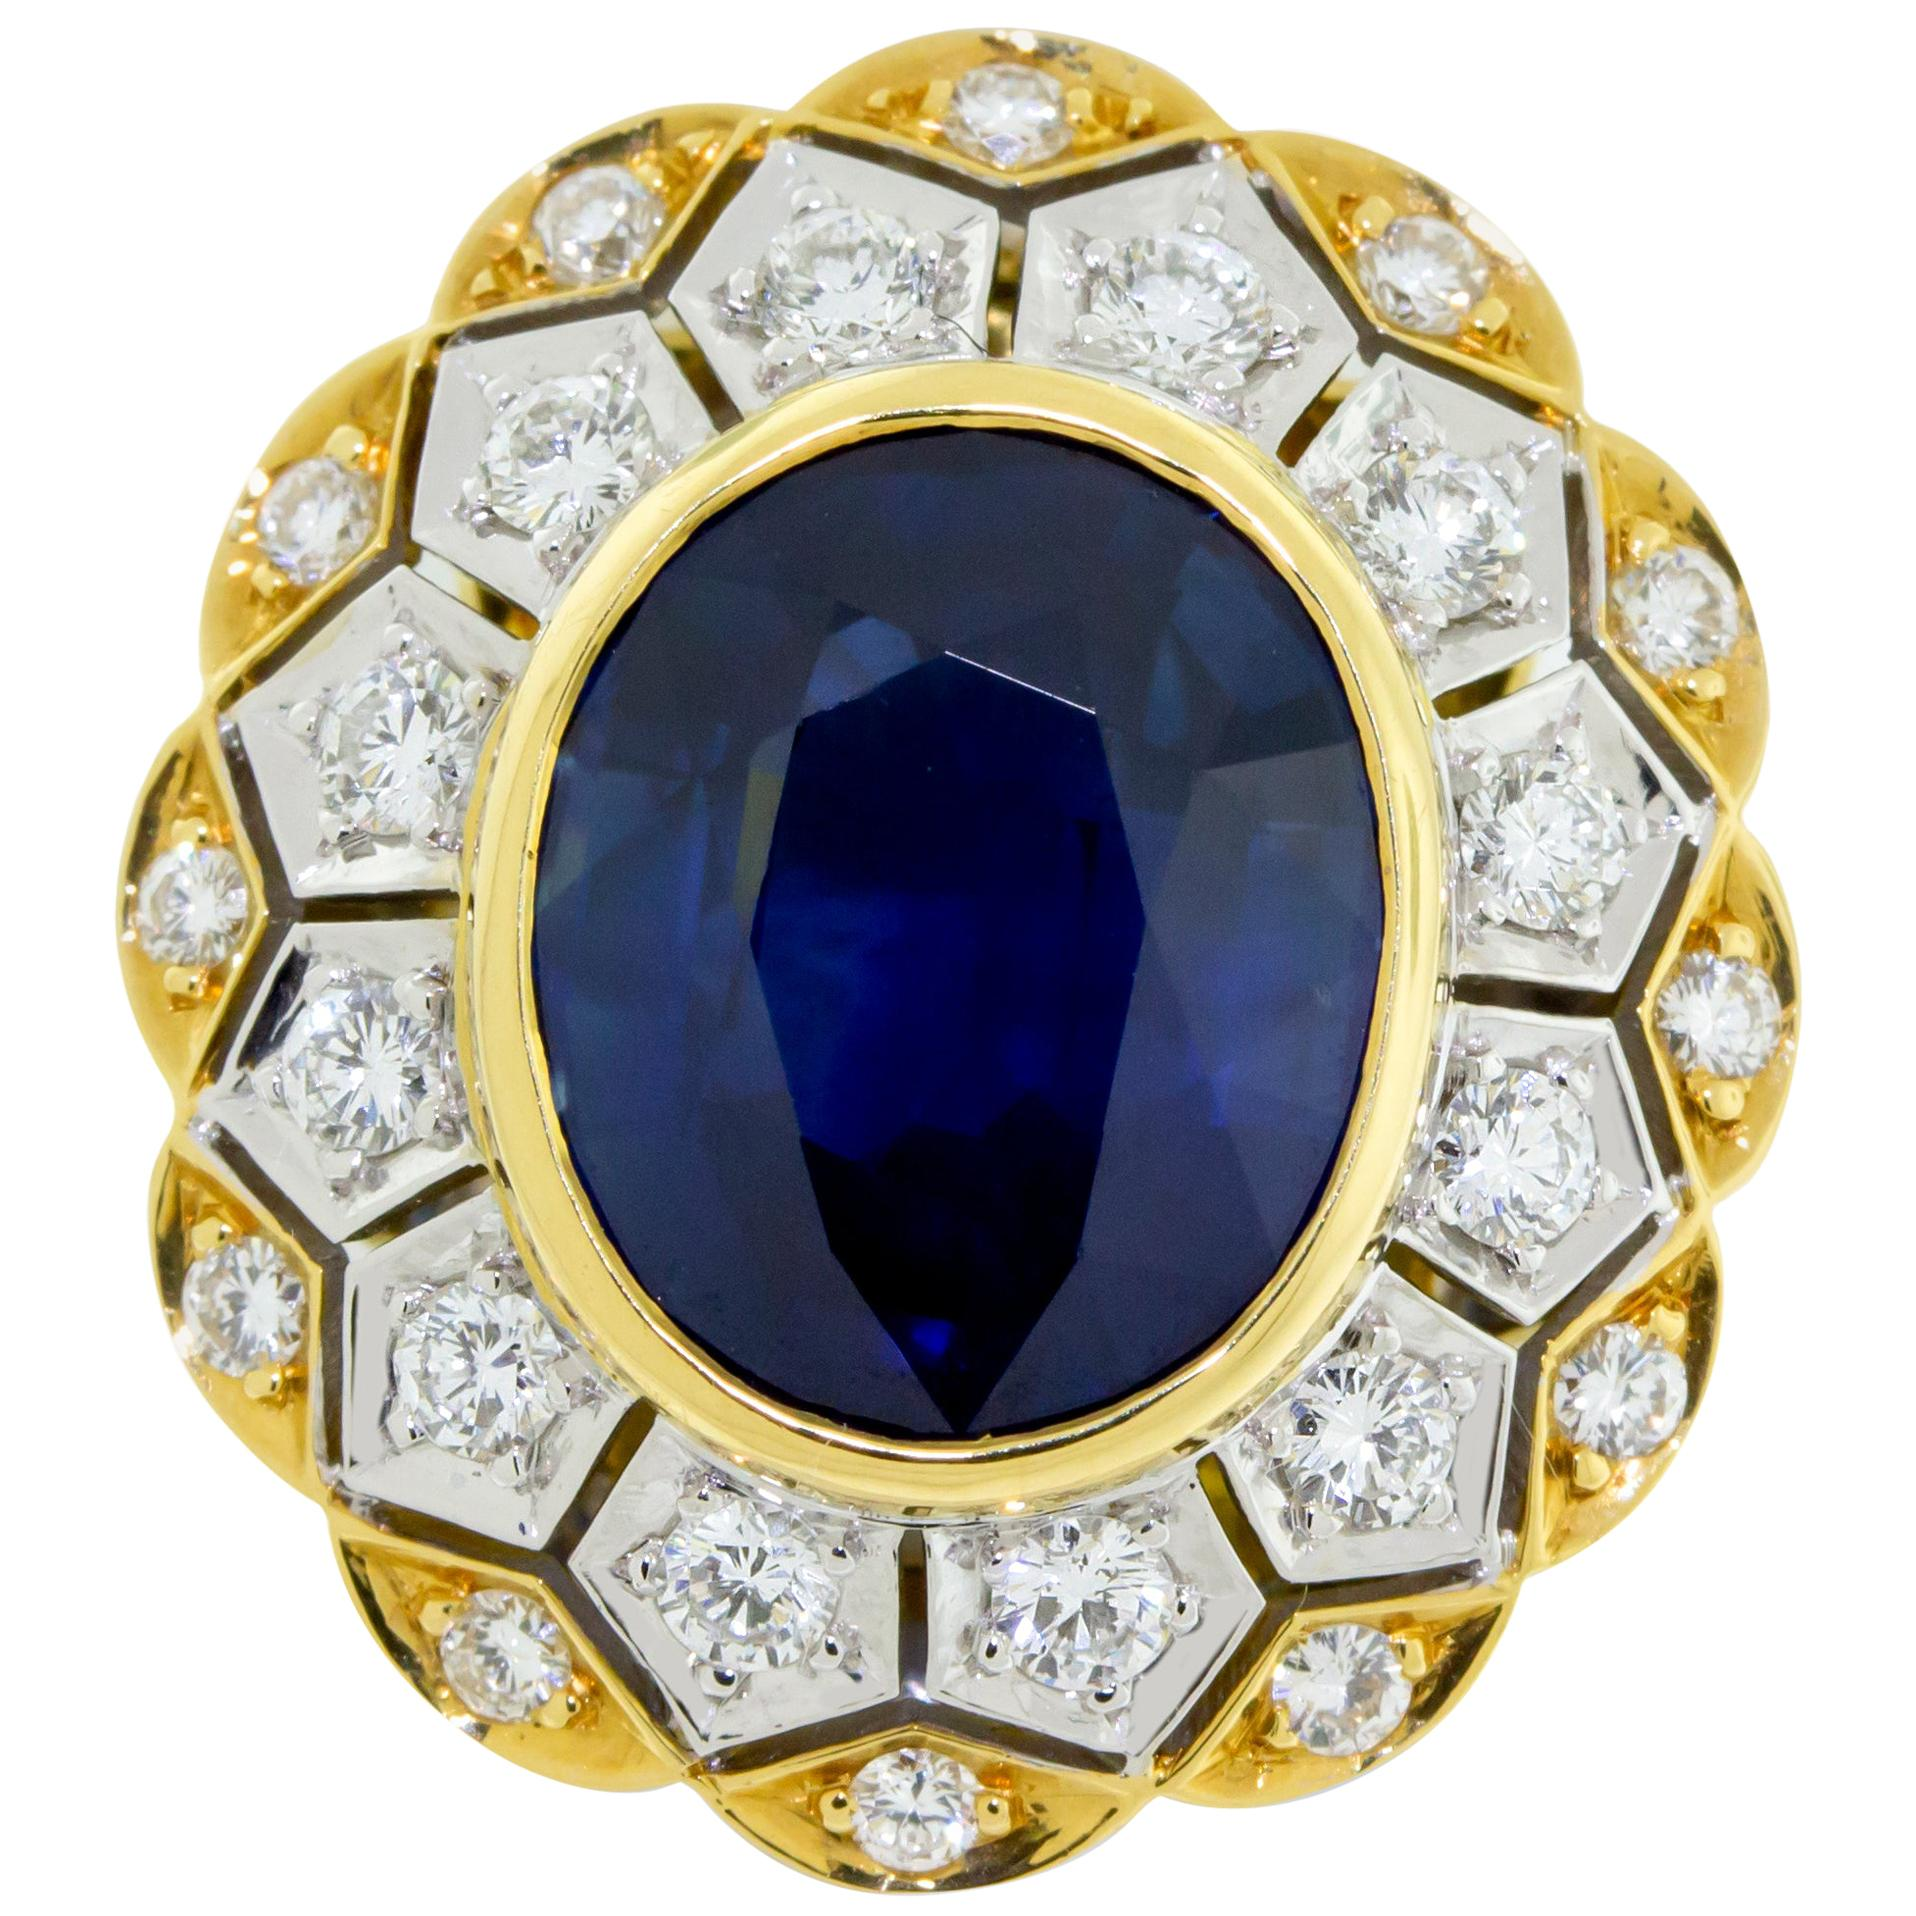 18 Karat Yellow and White Gold Sapphire and Diamond Ring